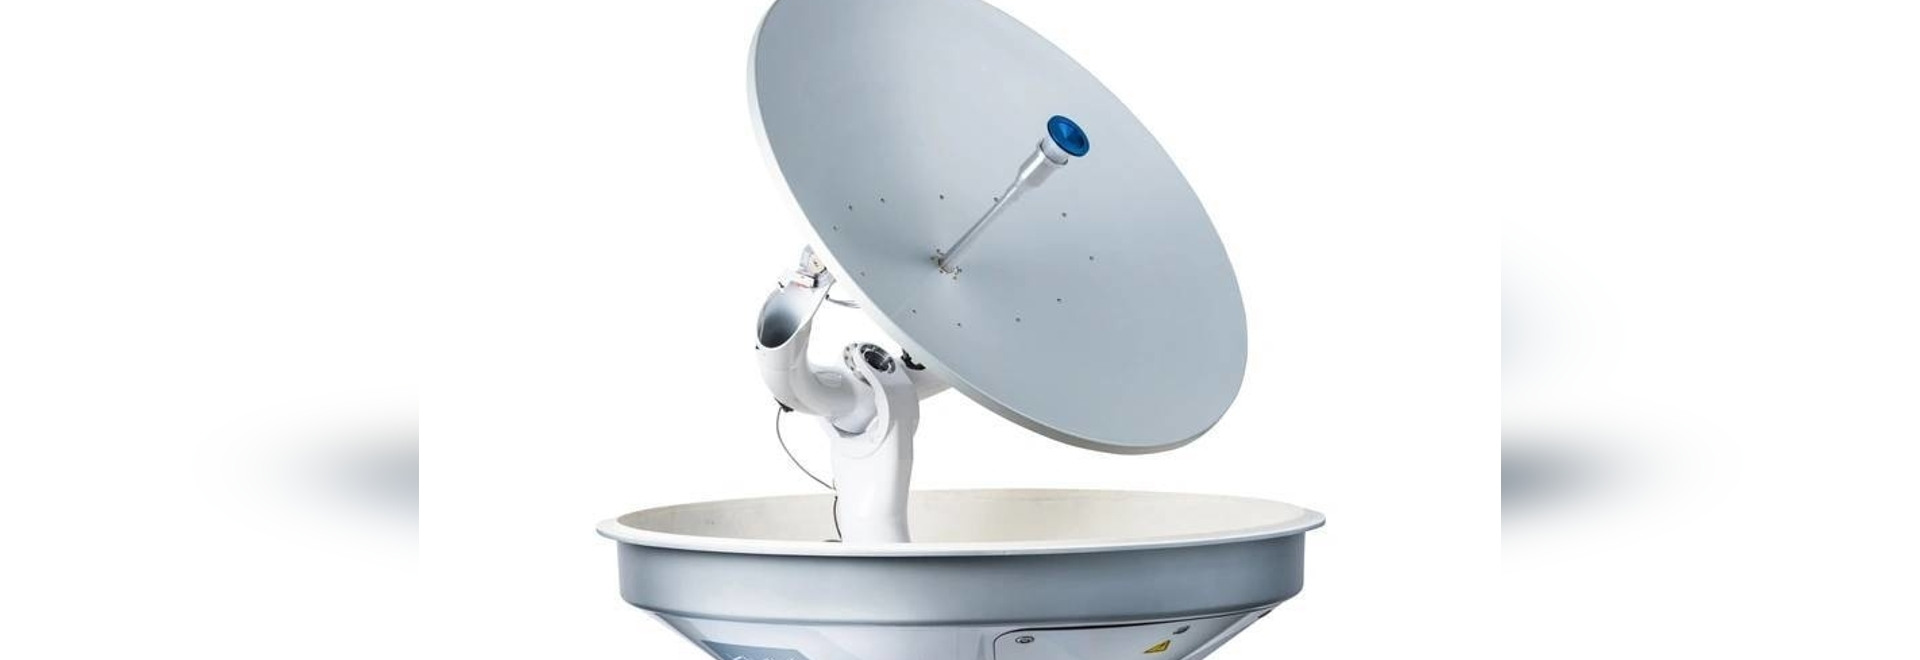 KVH Unveils TracVision TV10 Antenna